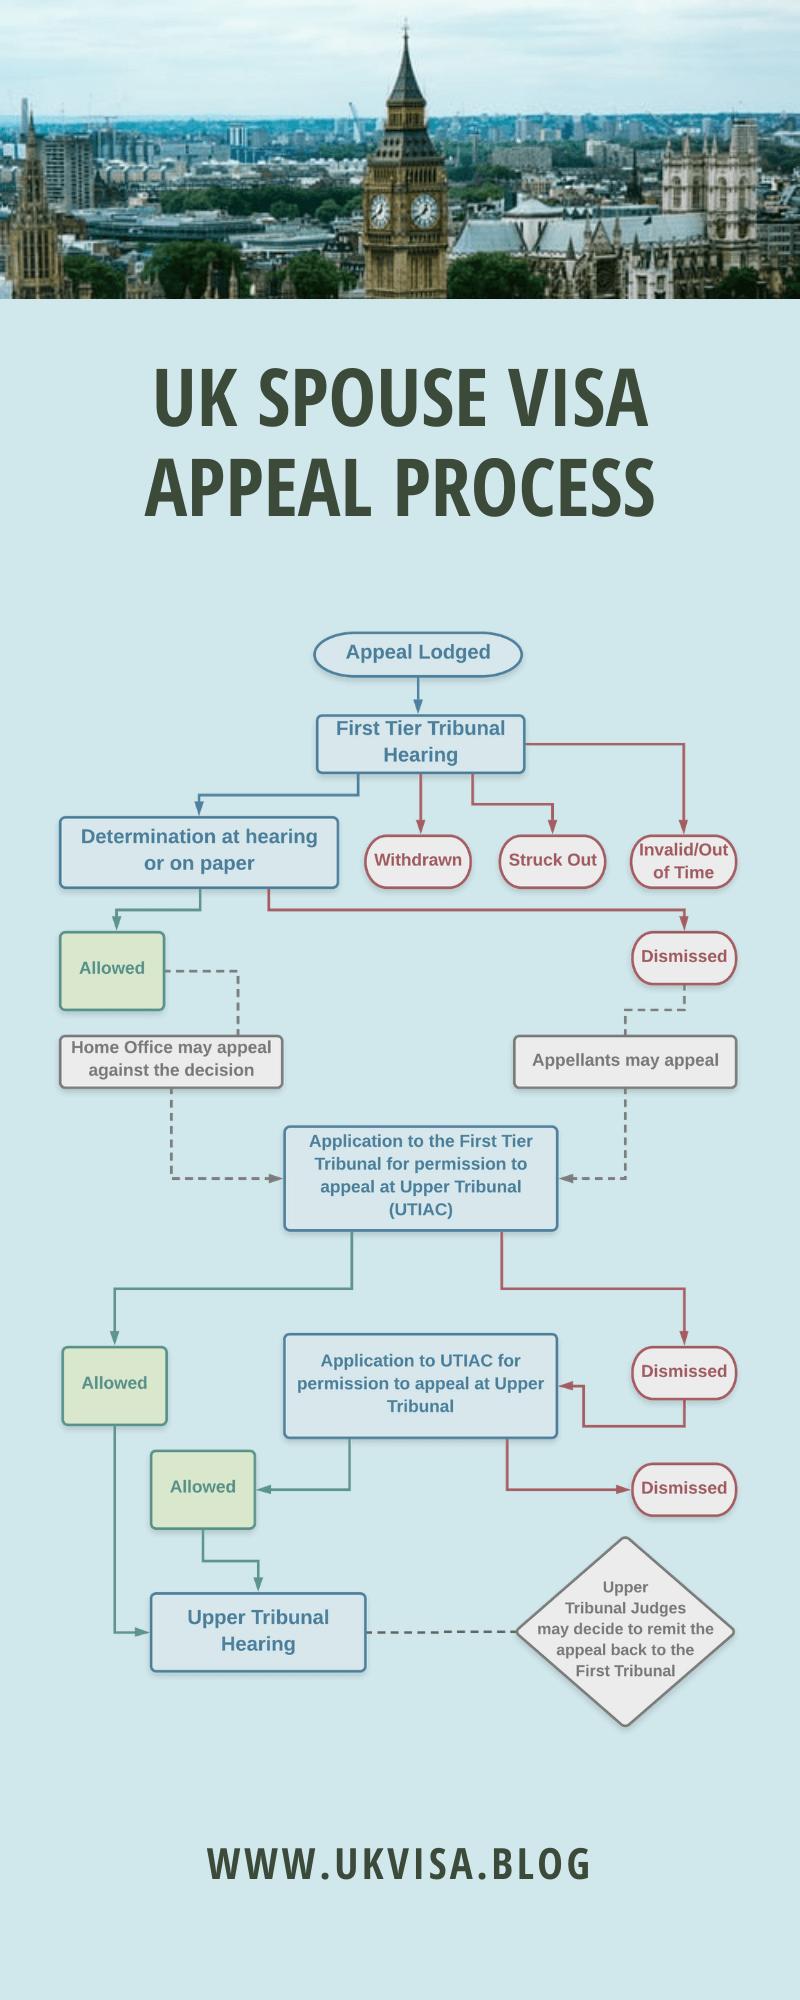 UK Spouse Visa Appeal Process